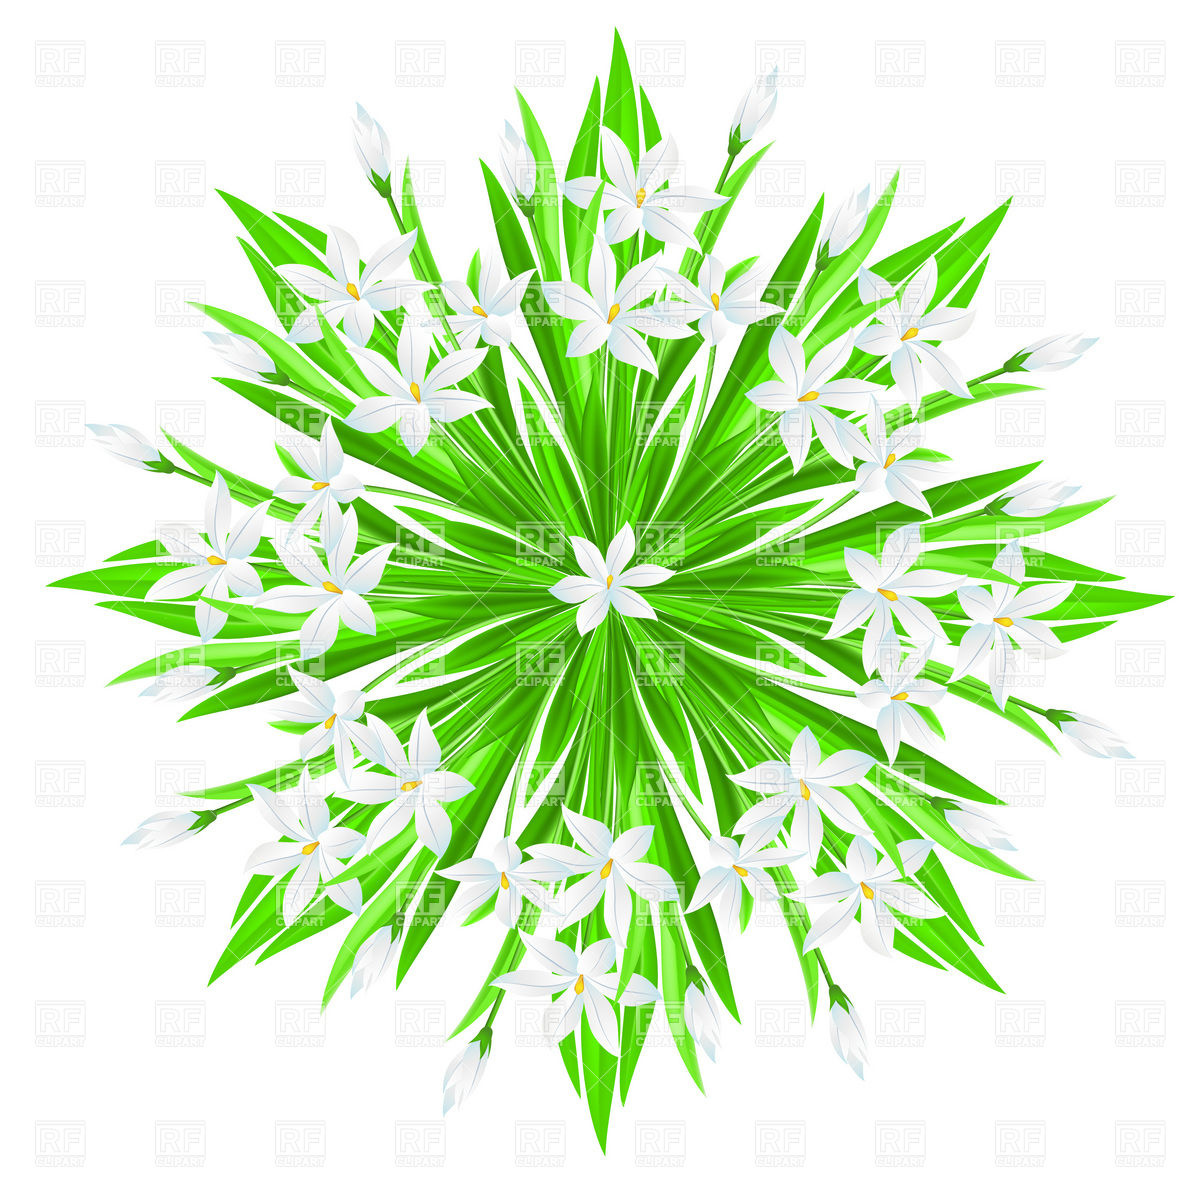 spring flower bouquet clipart - Clipground